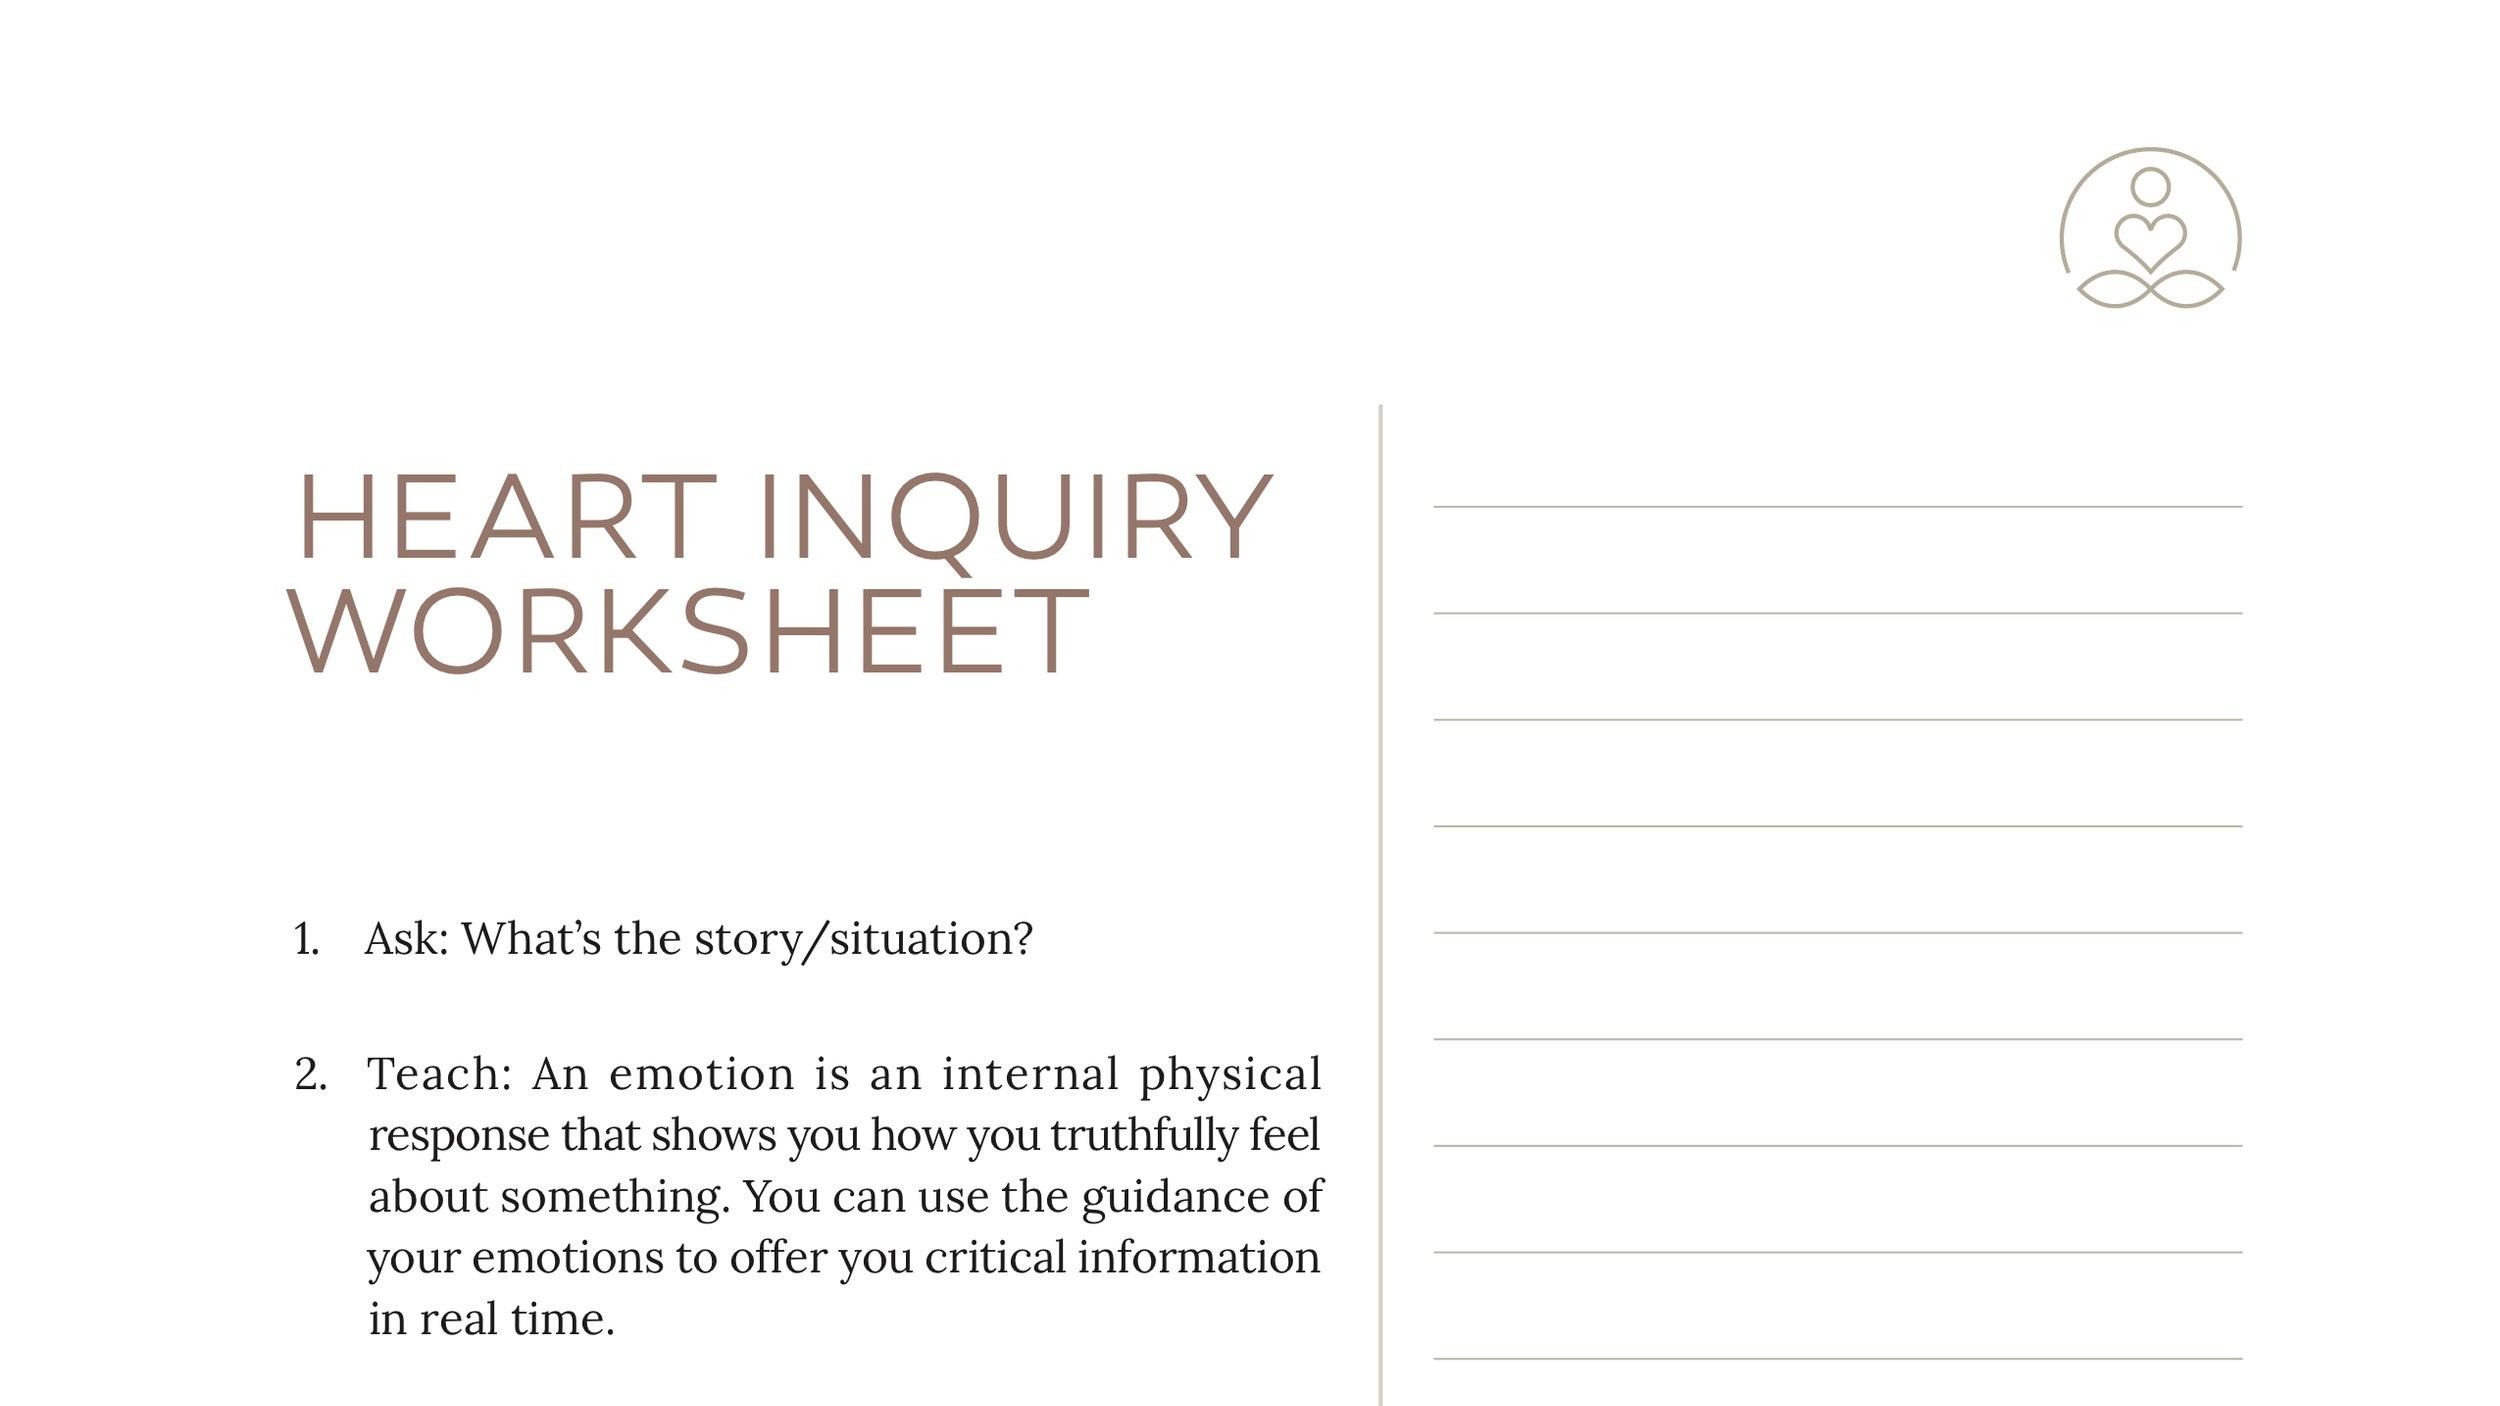 Heart Inquiry Worksheet.jpg